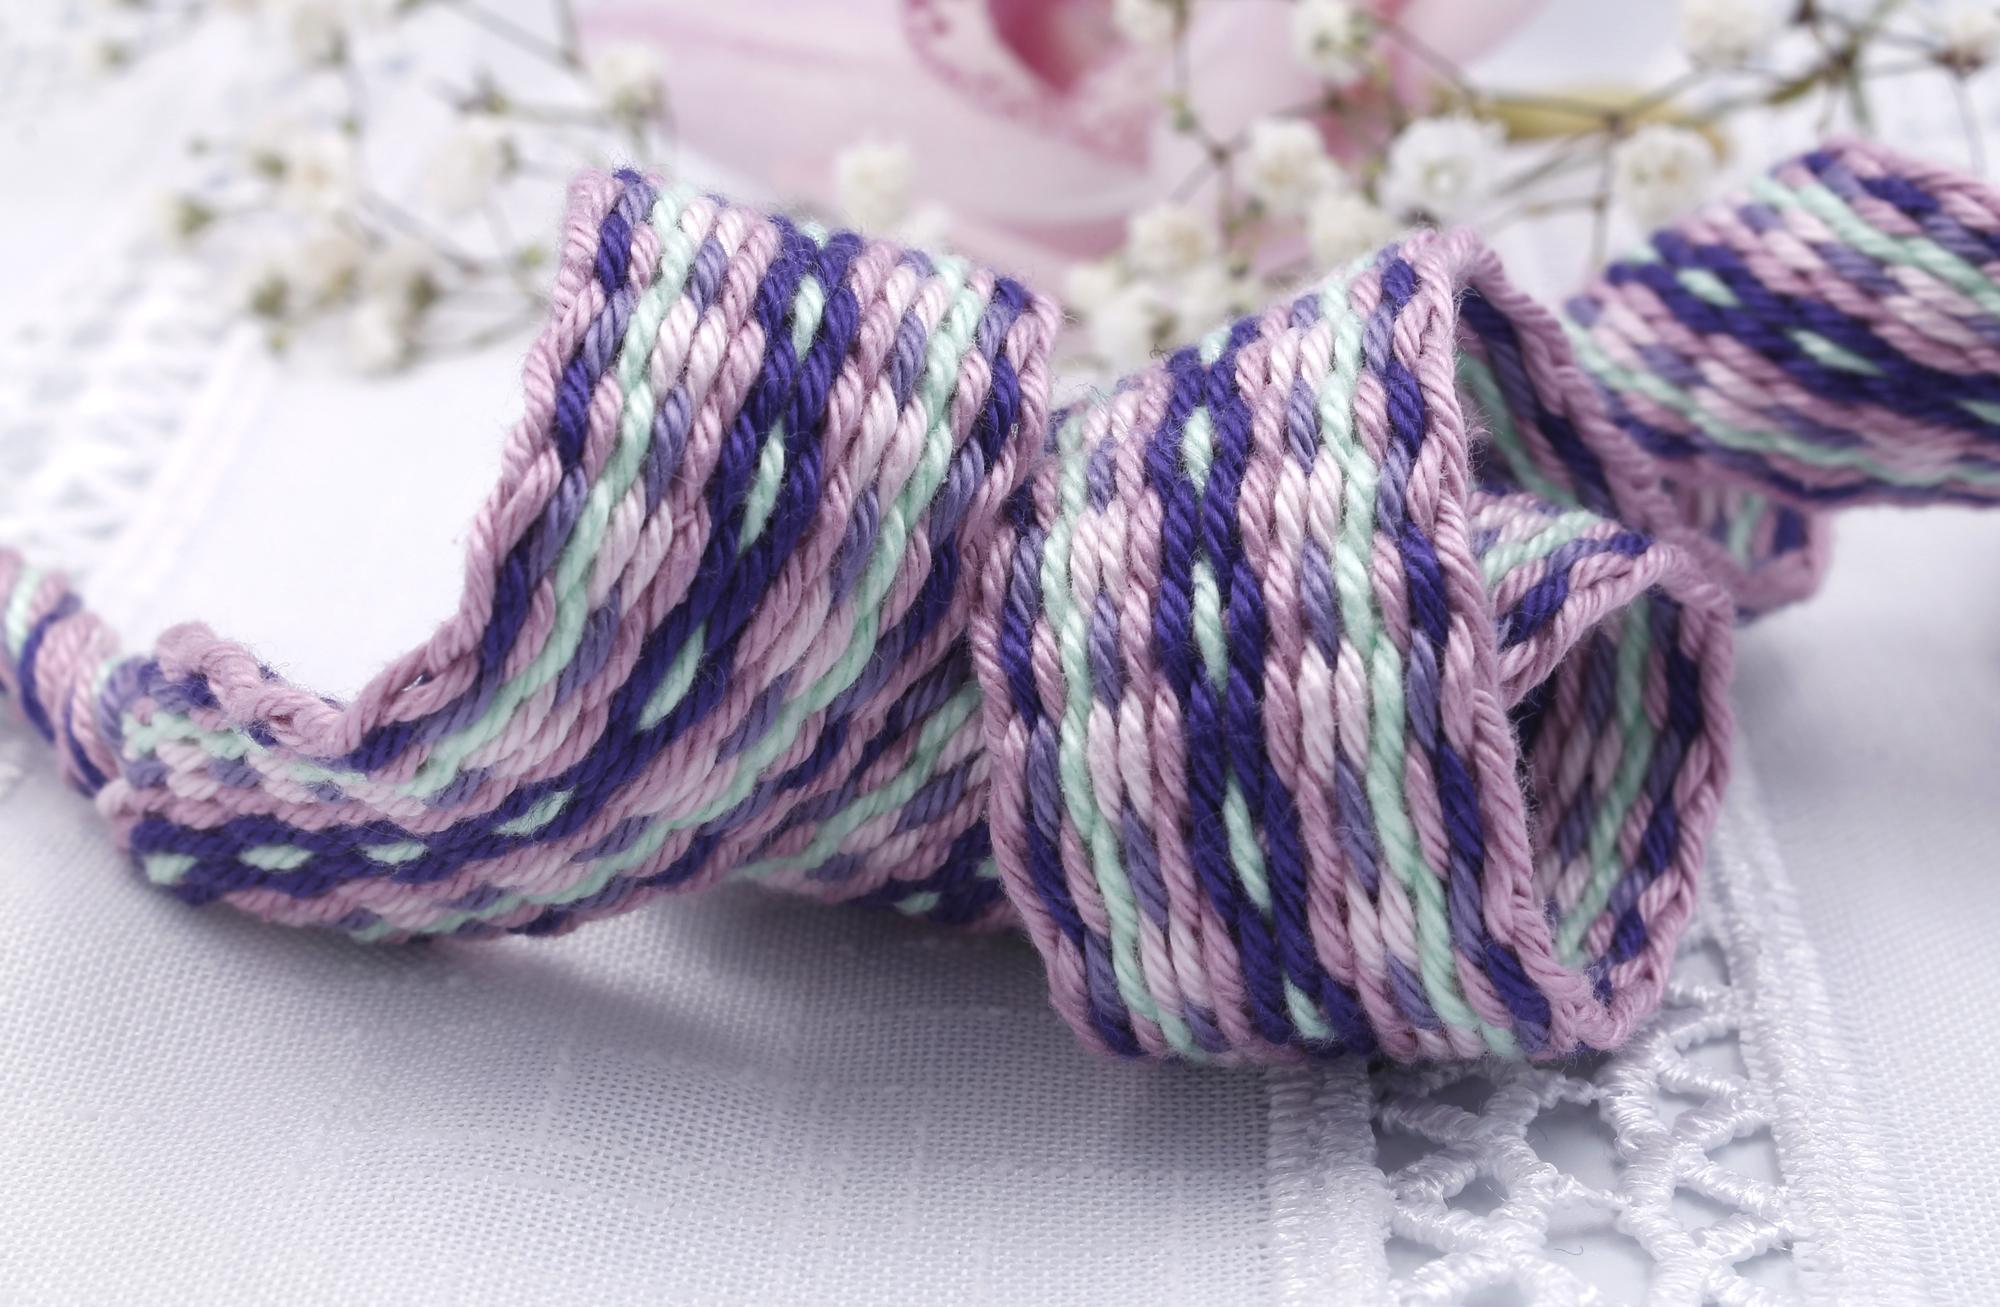 Cherry Blossom Handfasting Cord (8)